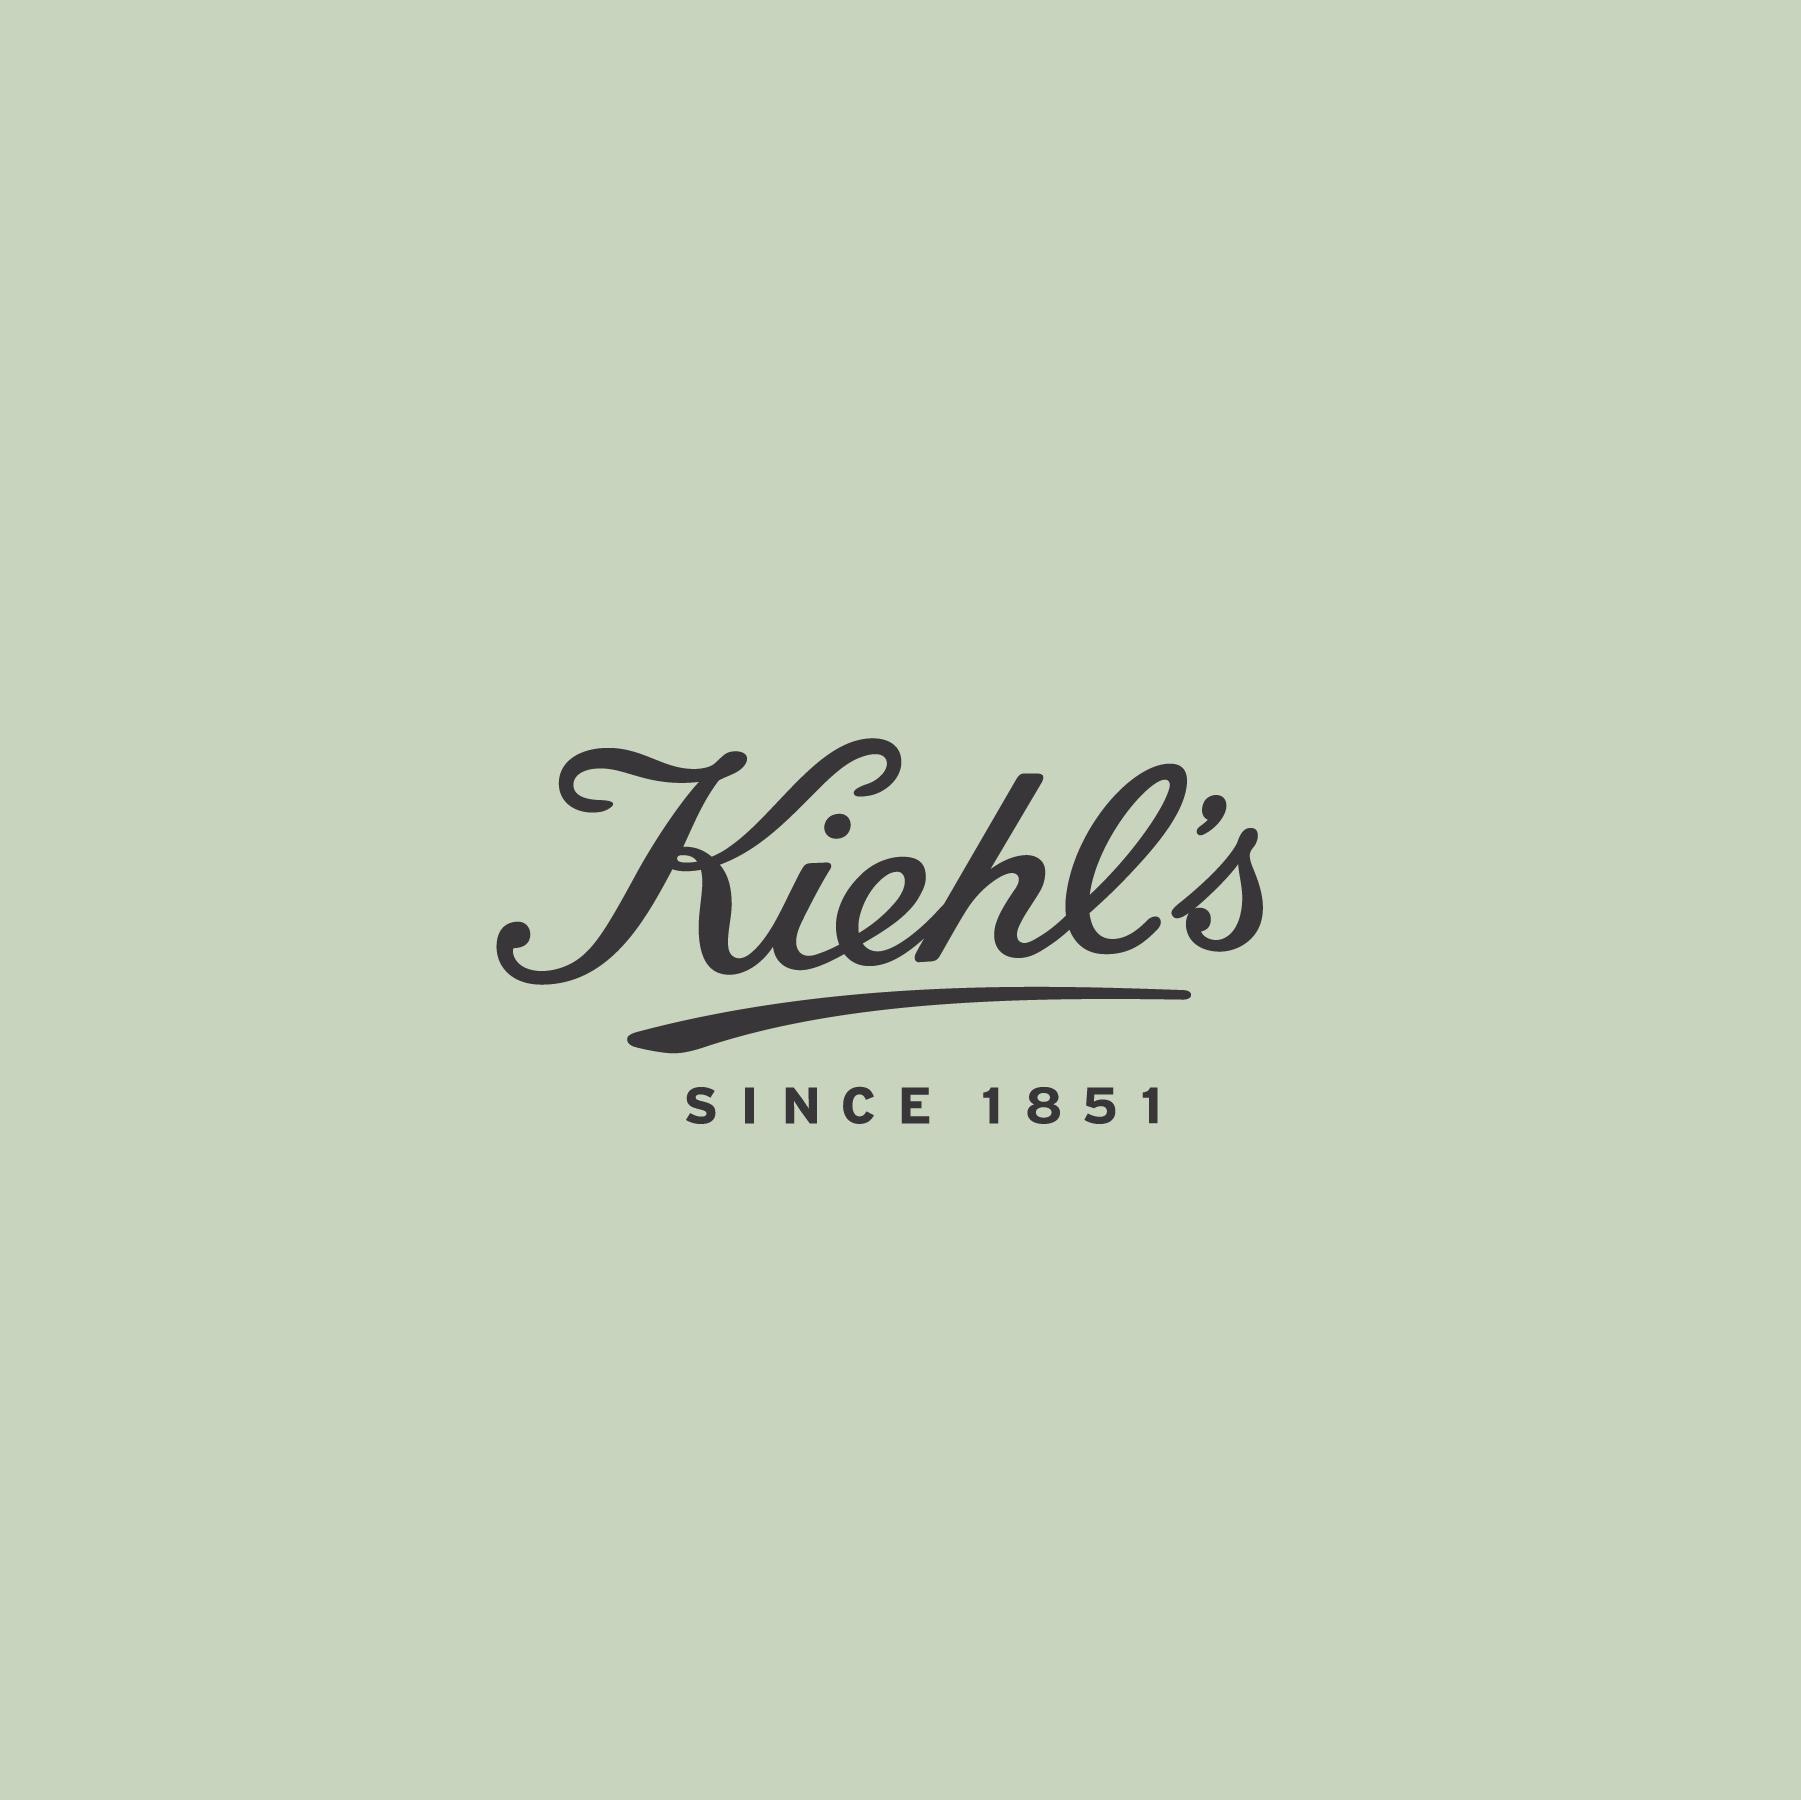 Kiehls.com Holiday Site - Client: L'Oreal for Mr YouthRole: WordsCD: Asia GilesAD: Sweta Patel  digital  